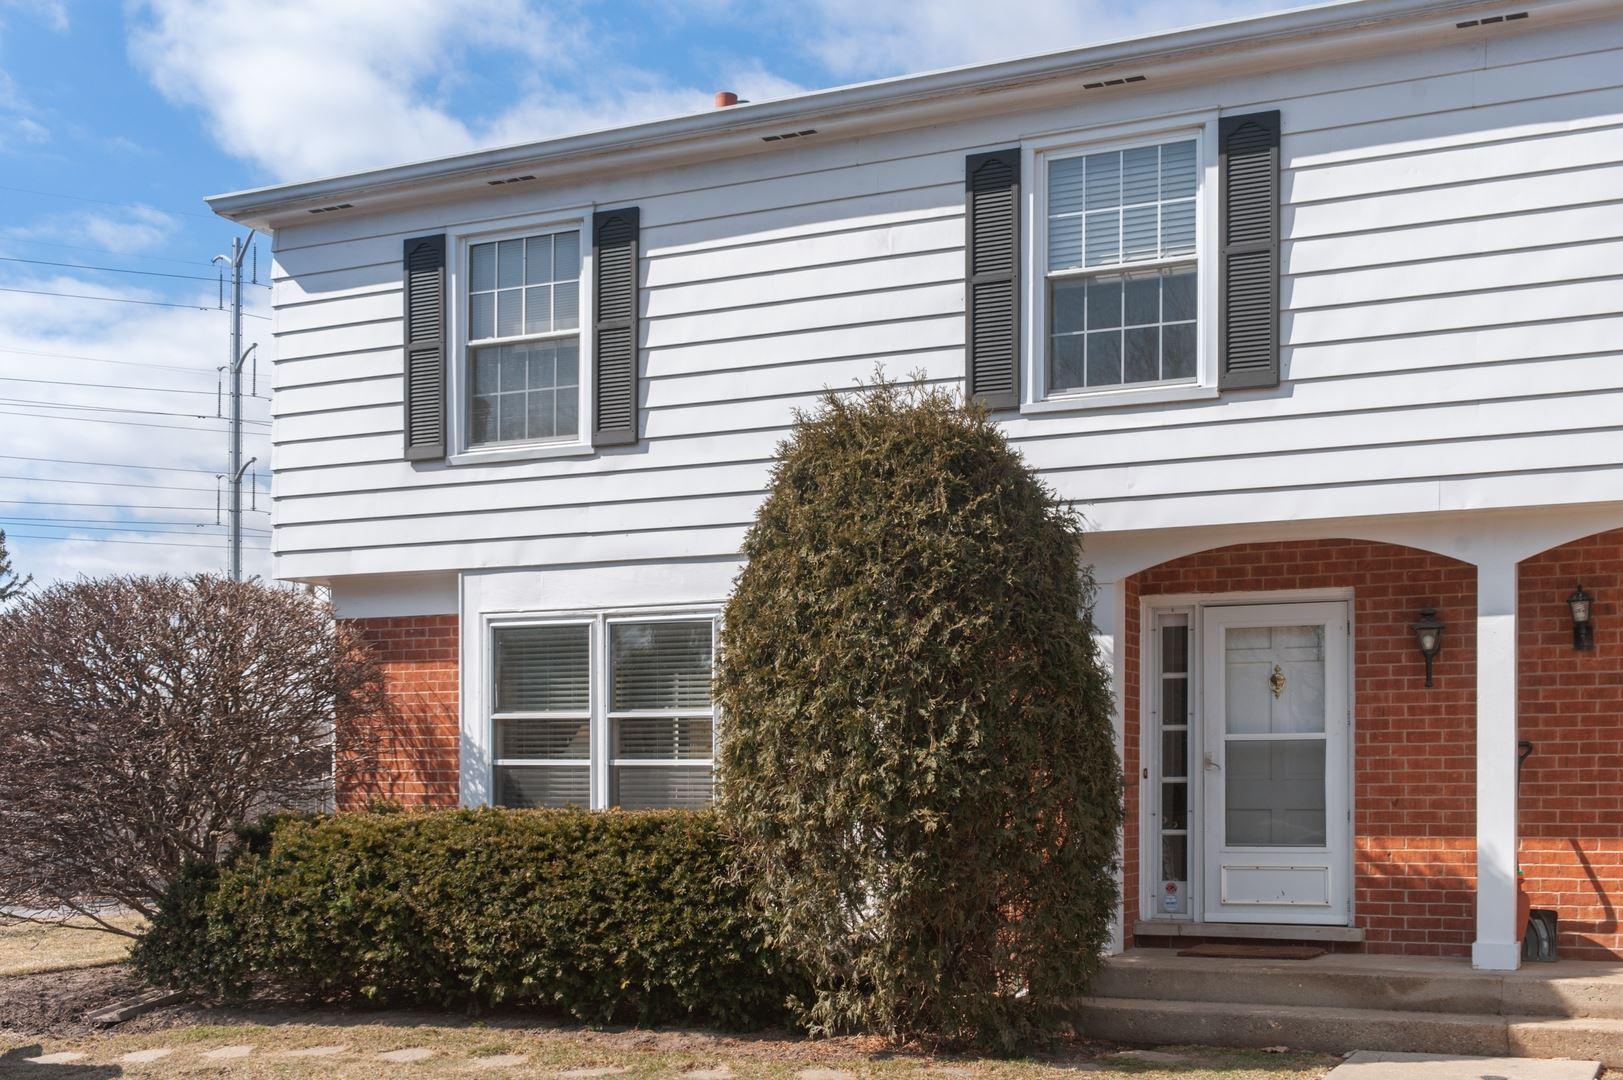 1741 Colonial Lane, Northfield, IL 60093 - MLS#: 10662300